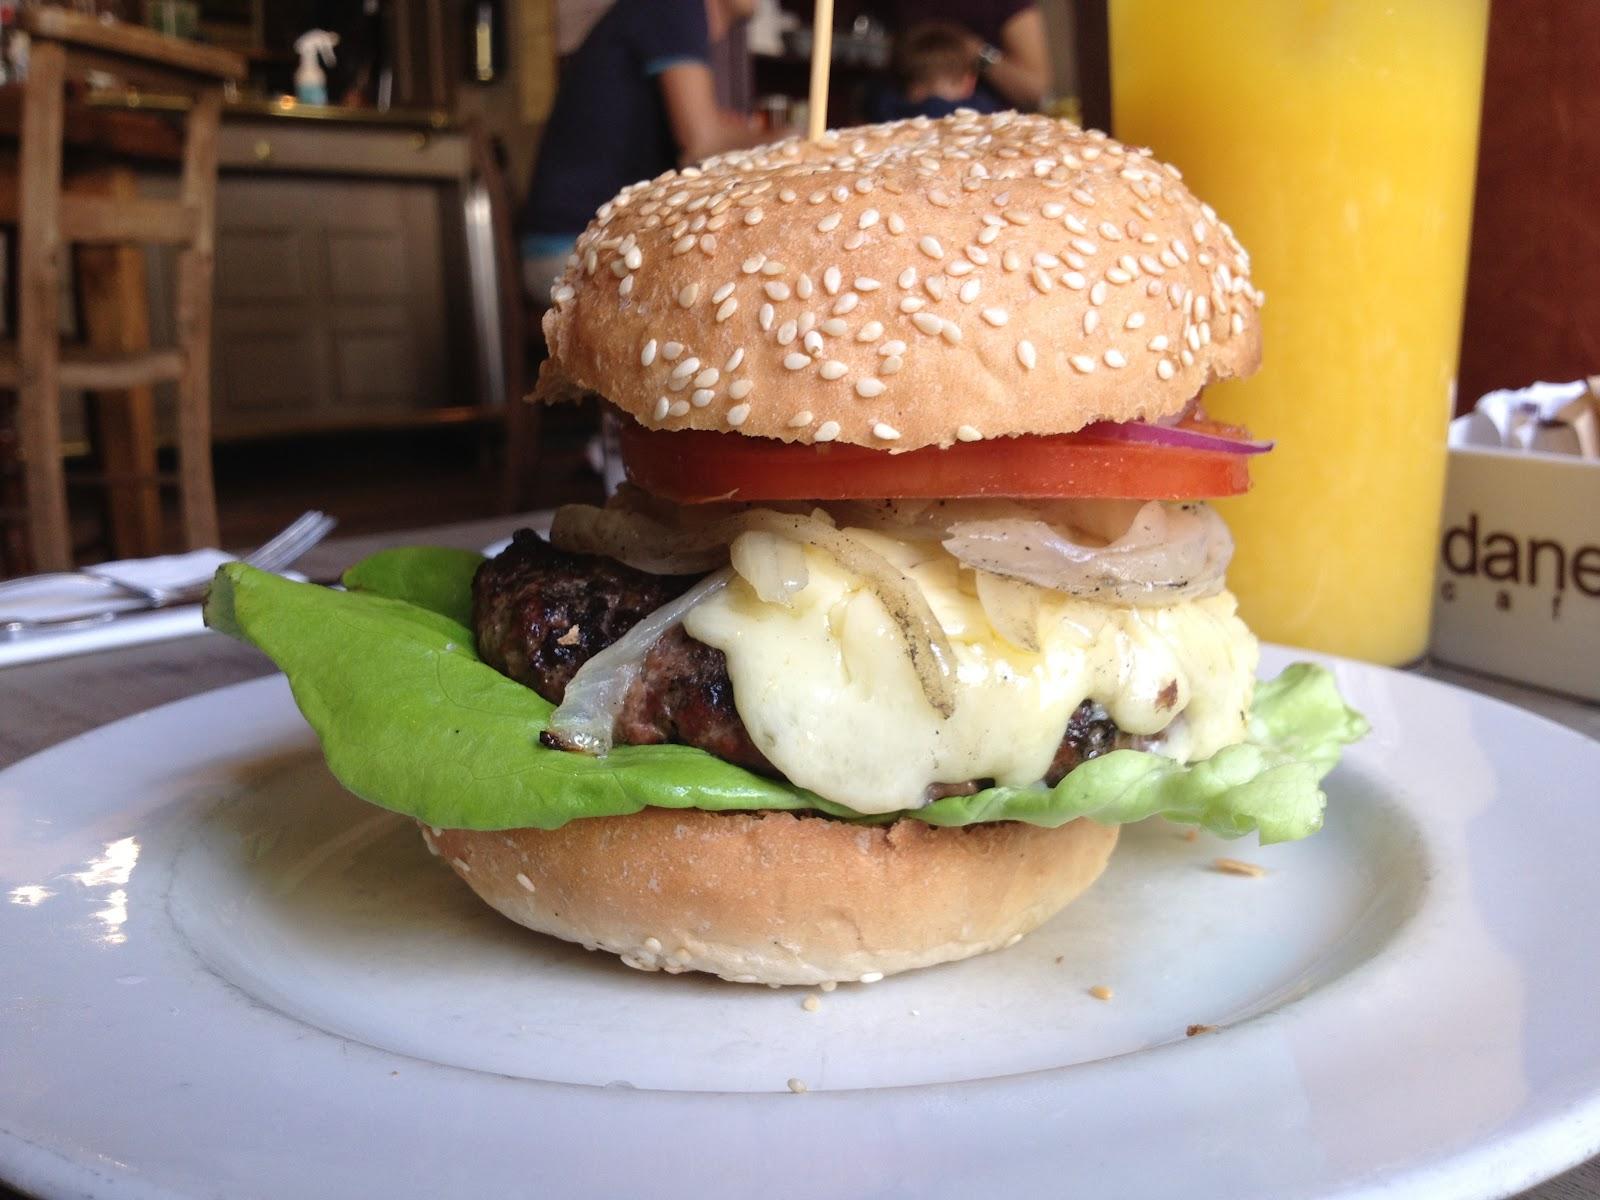 Herbal hibiscus tea 55g dr bean australia - Best Burger Quest The Cambridge Bar